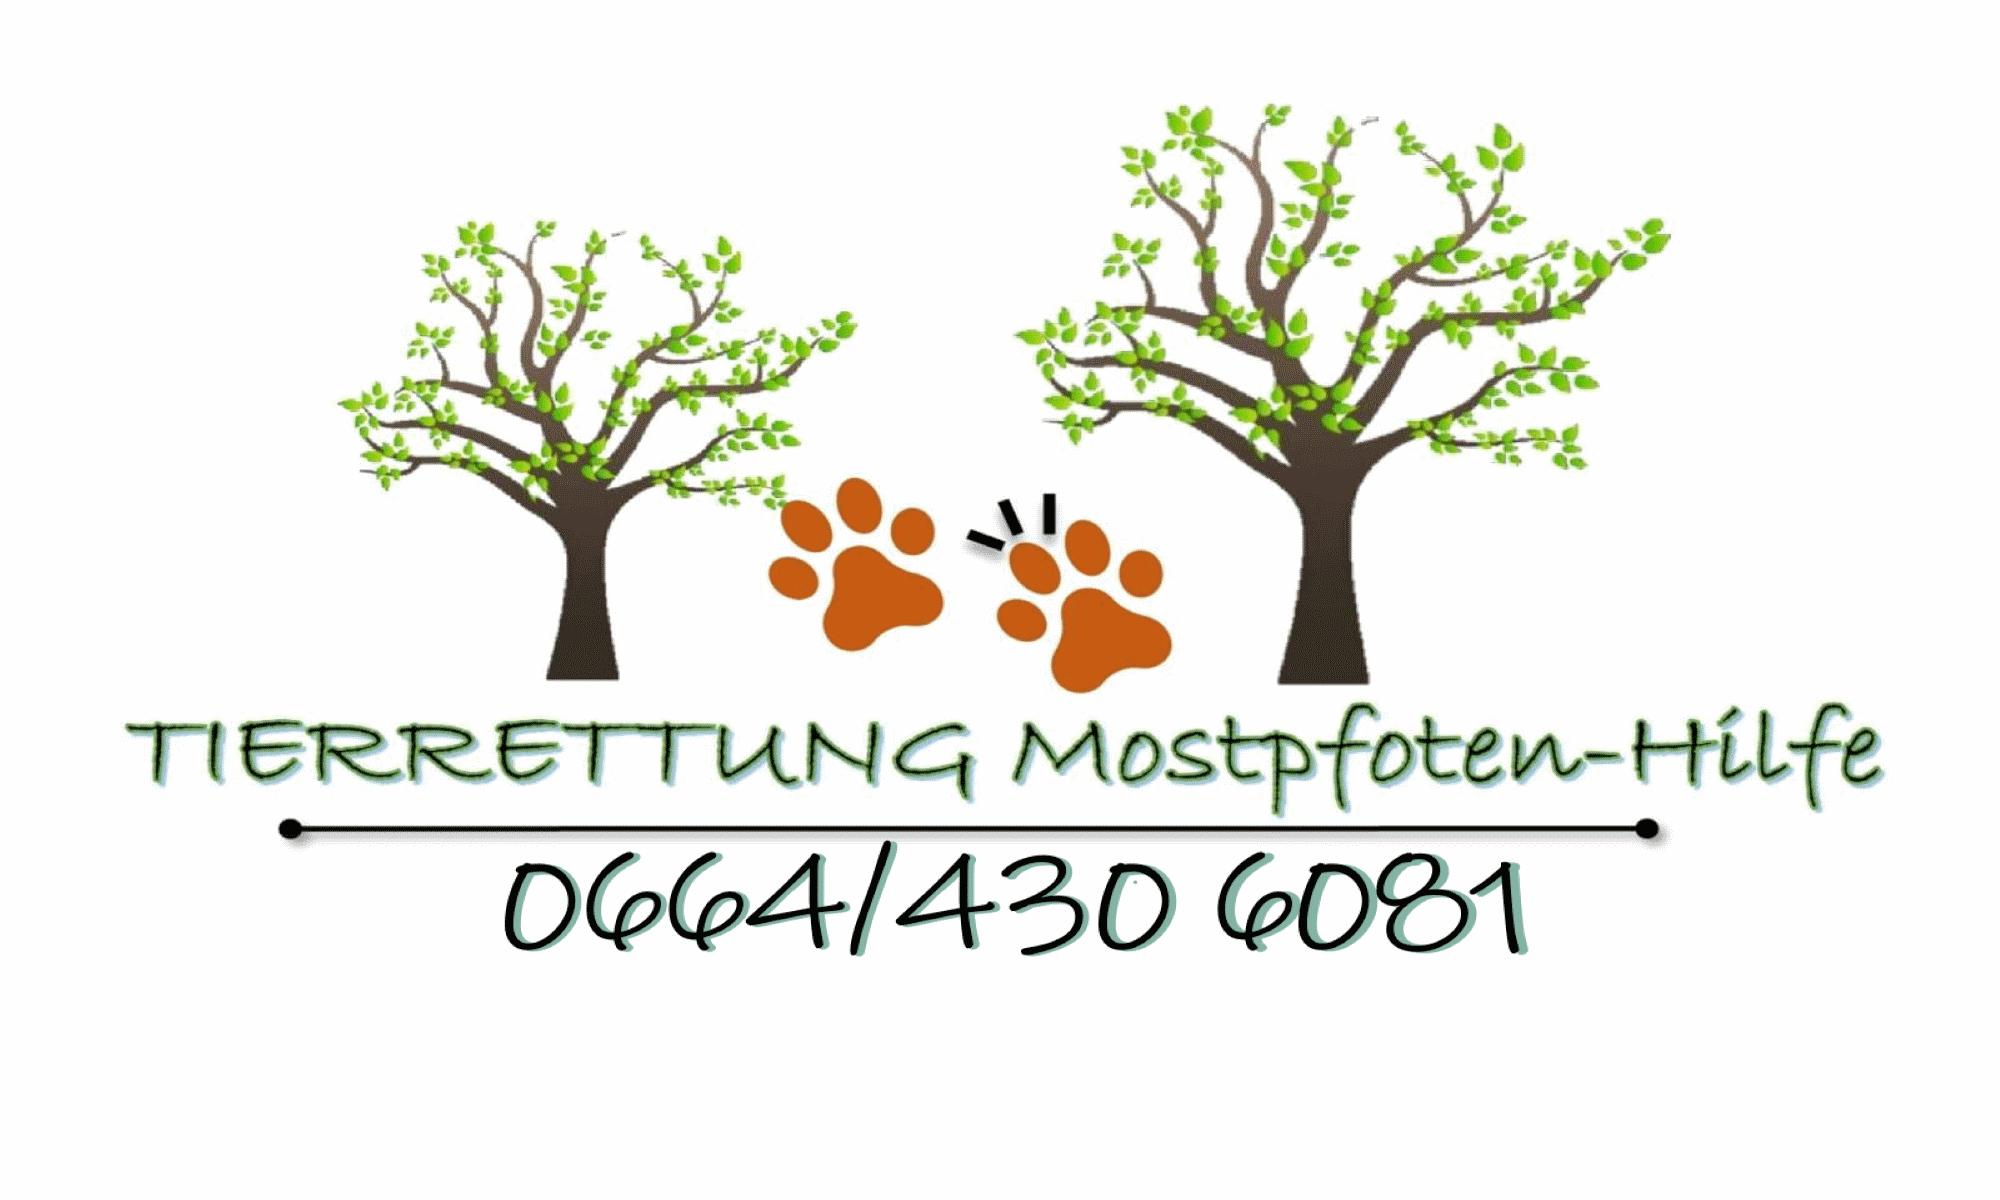 Tierrettung Mostpfoten Hilfe